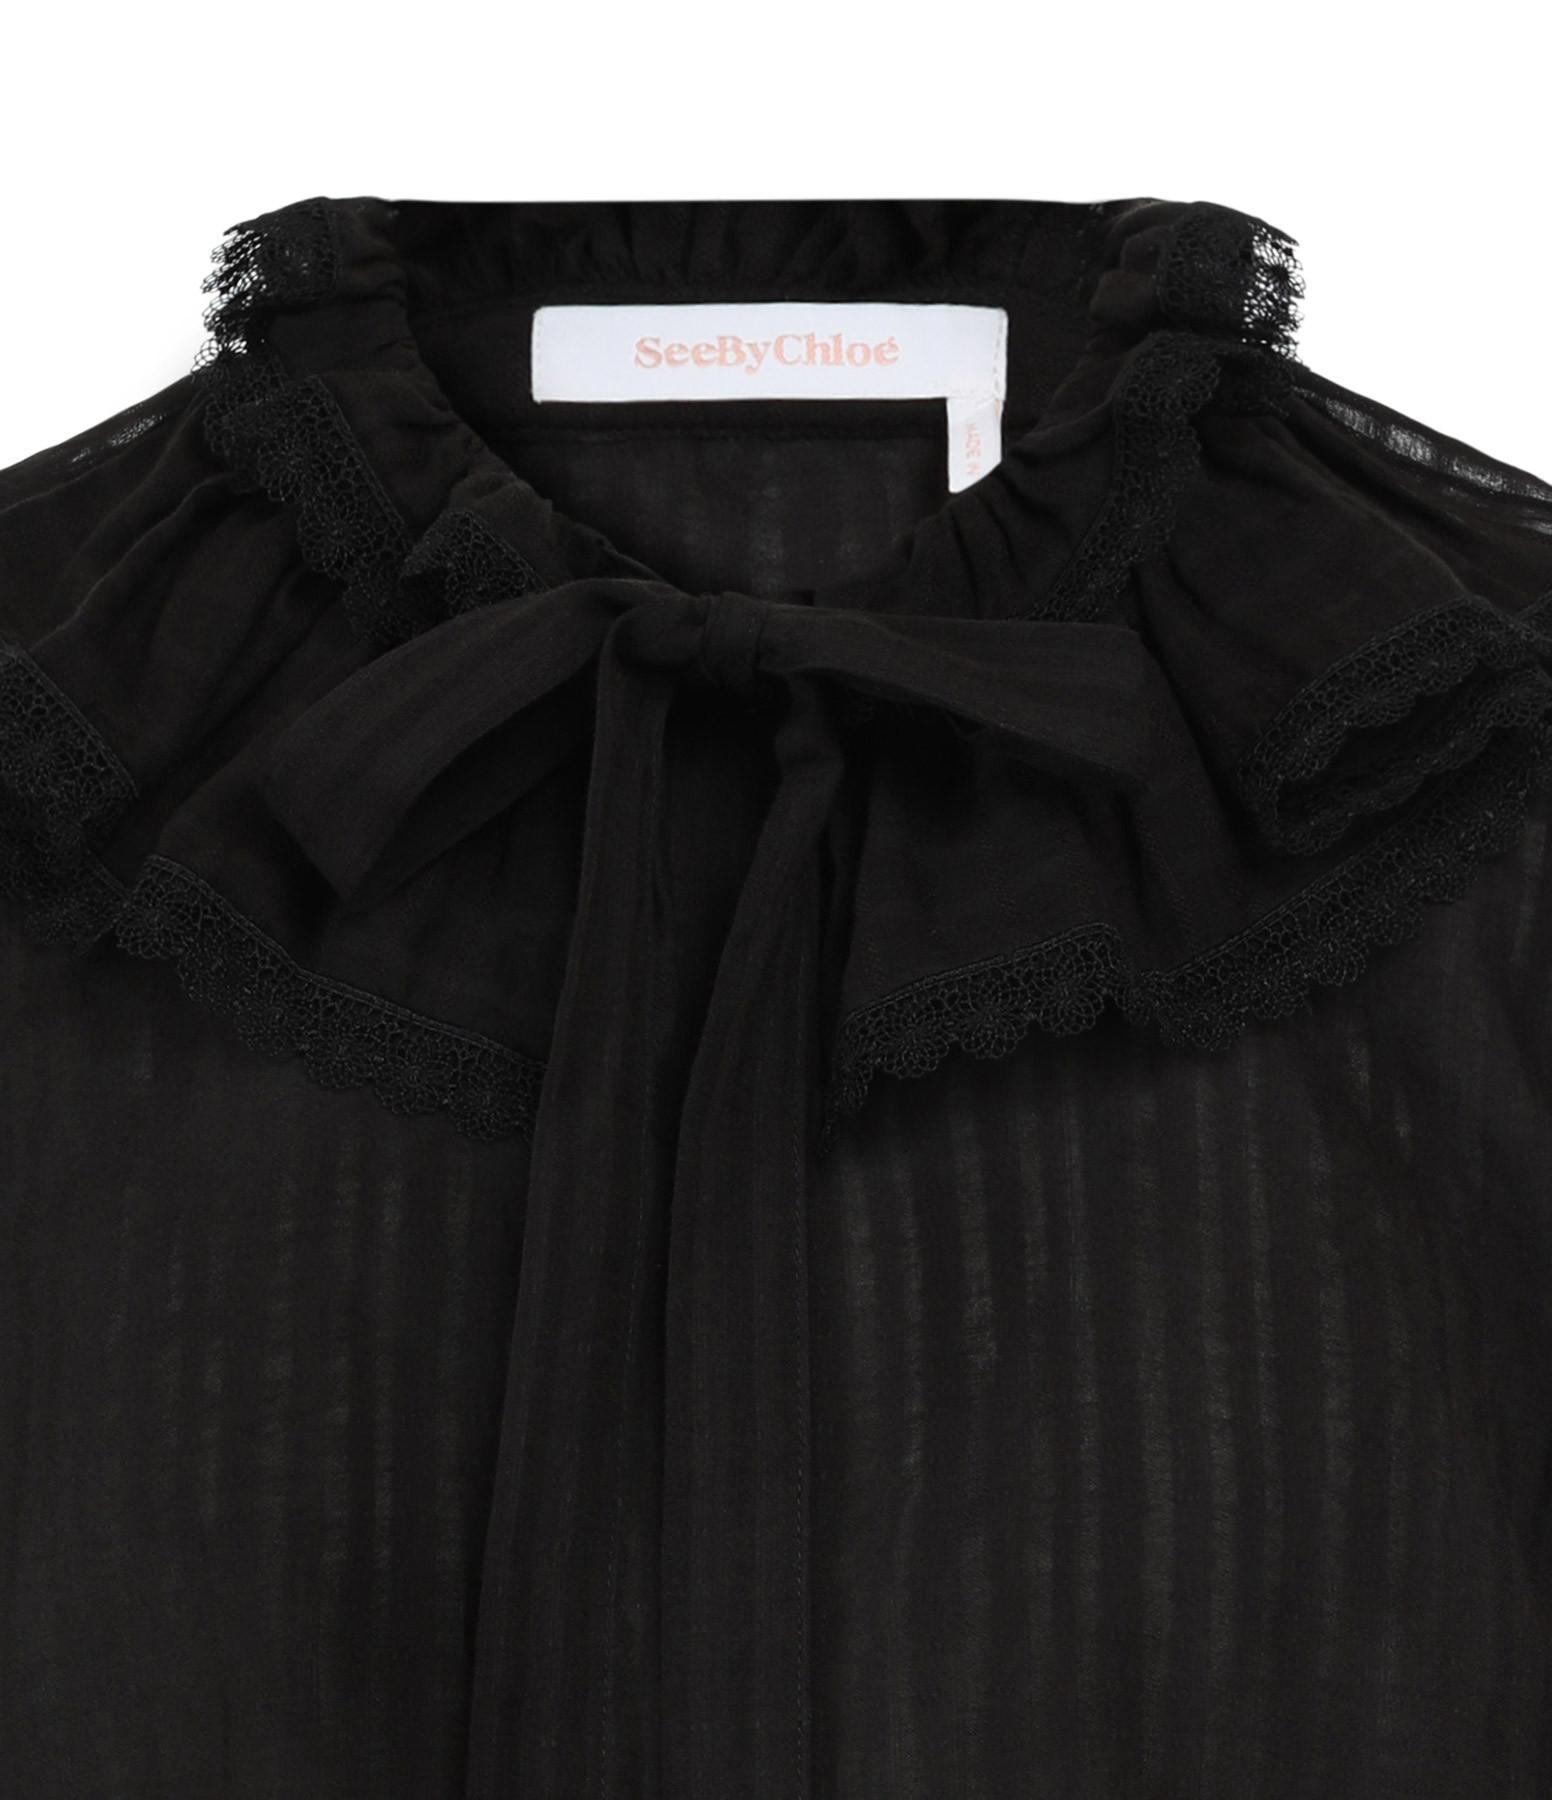 SEE BY CHLOE - Blouse Volants Noir